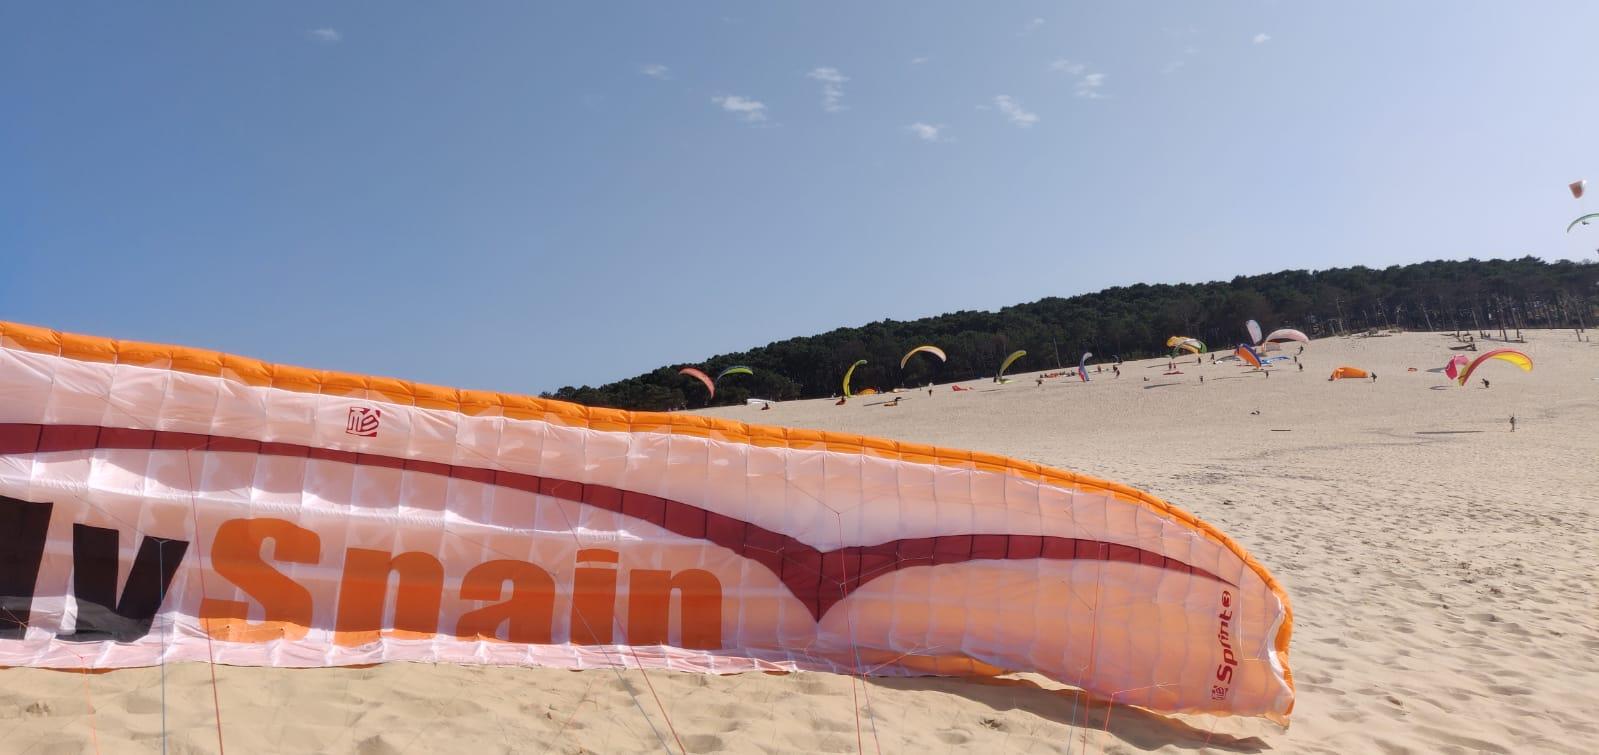 FlySpain at Dune De Pyla, France